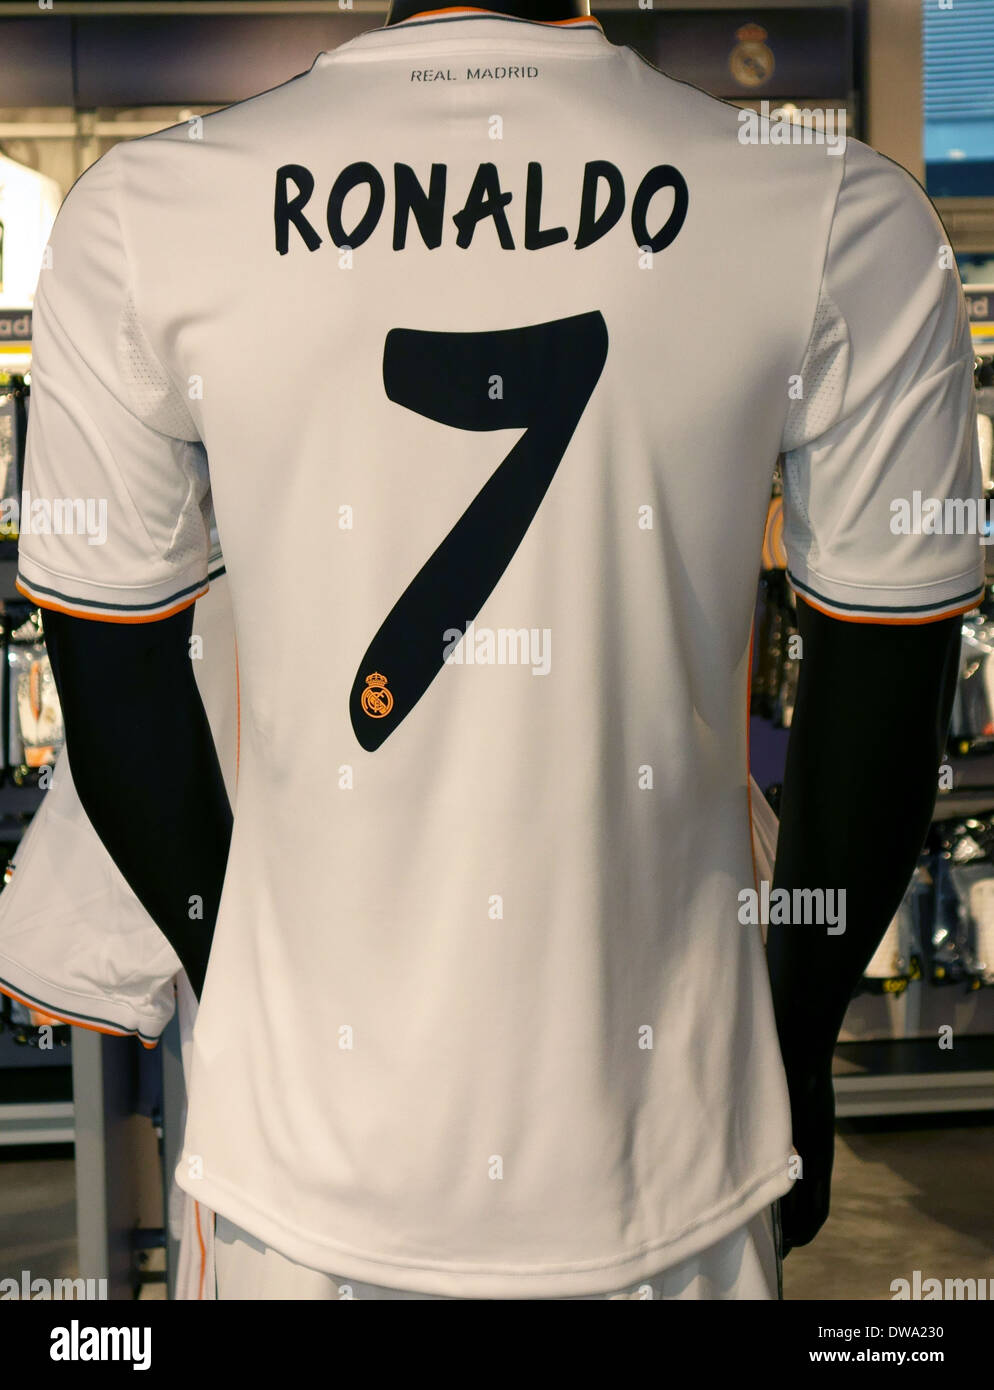 7be4c8cf714 Ronaldo shirt in Real Madrid official shop in Bernabeu Stadium ...